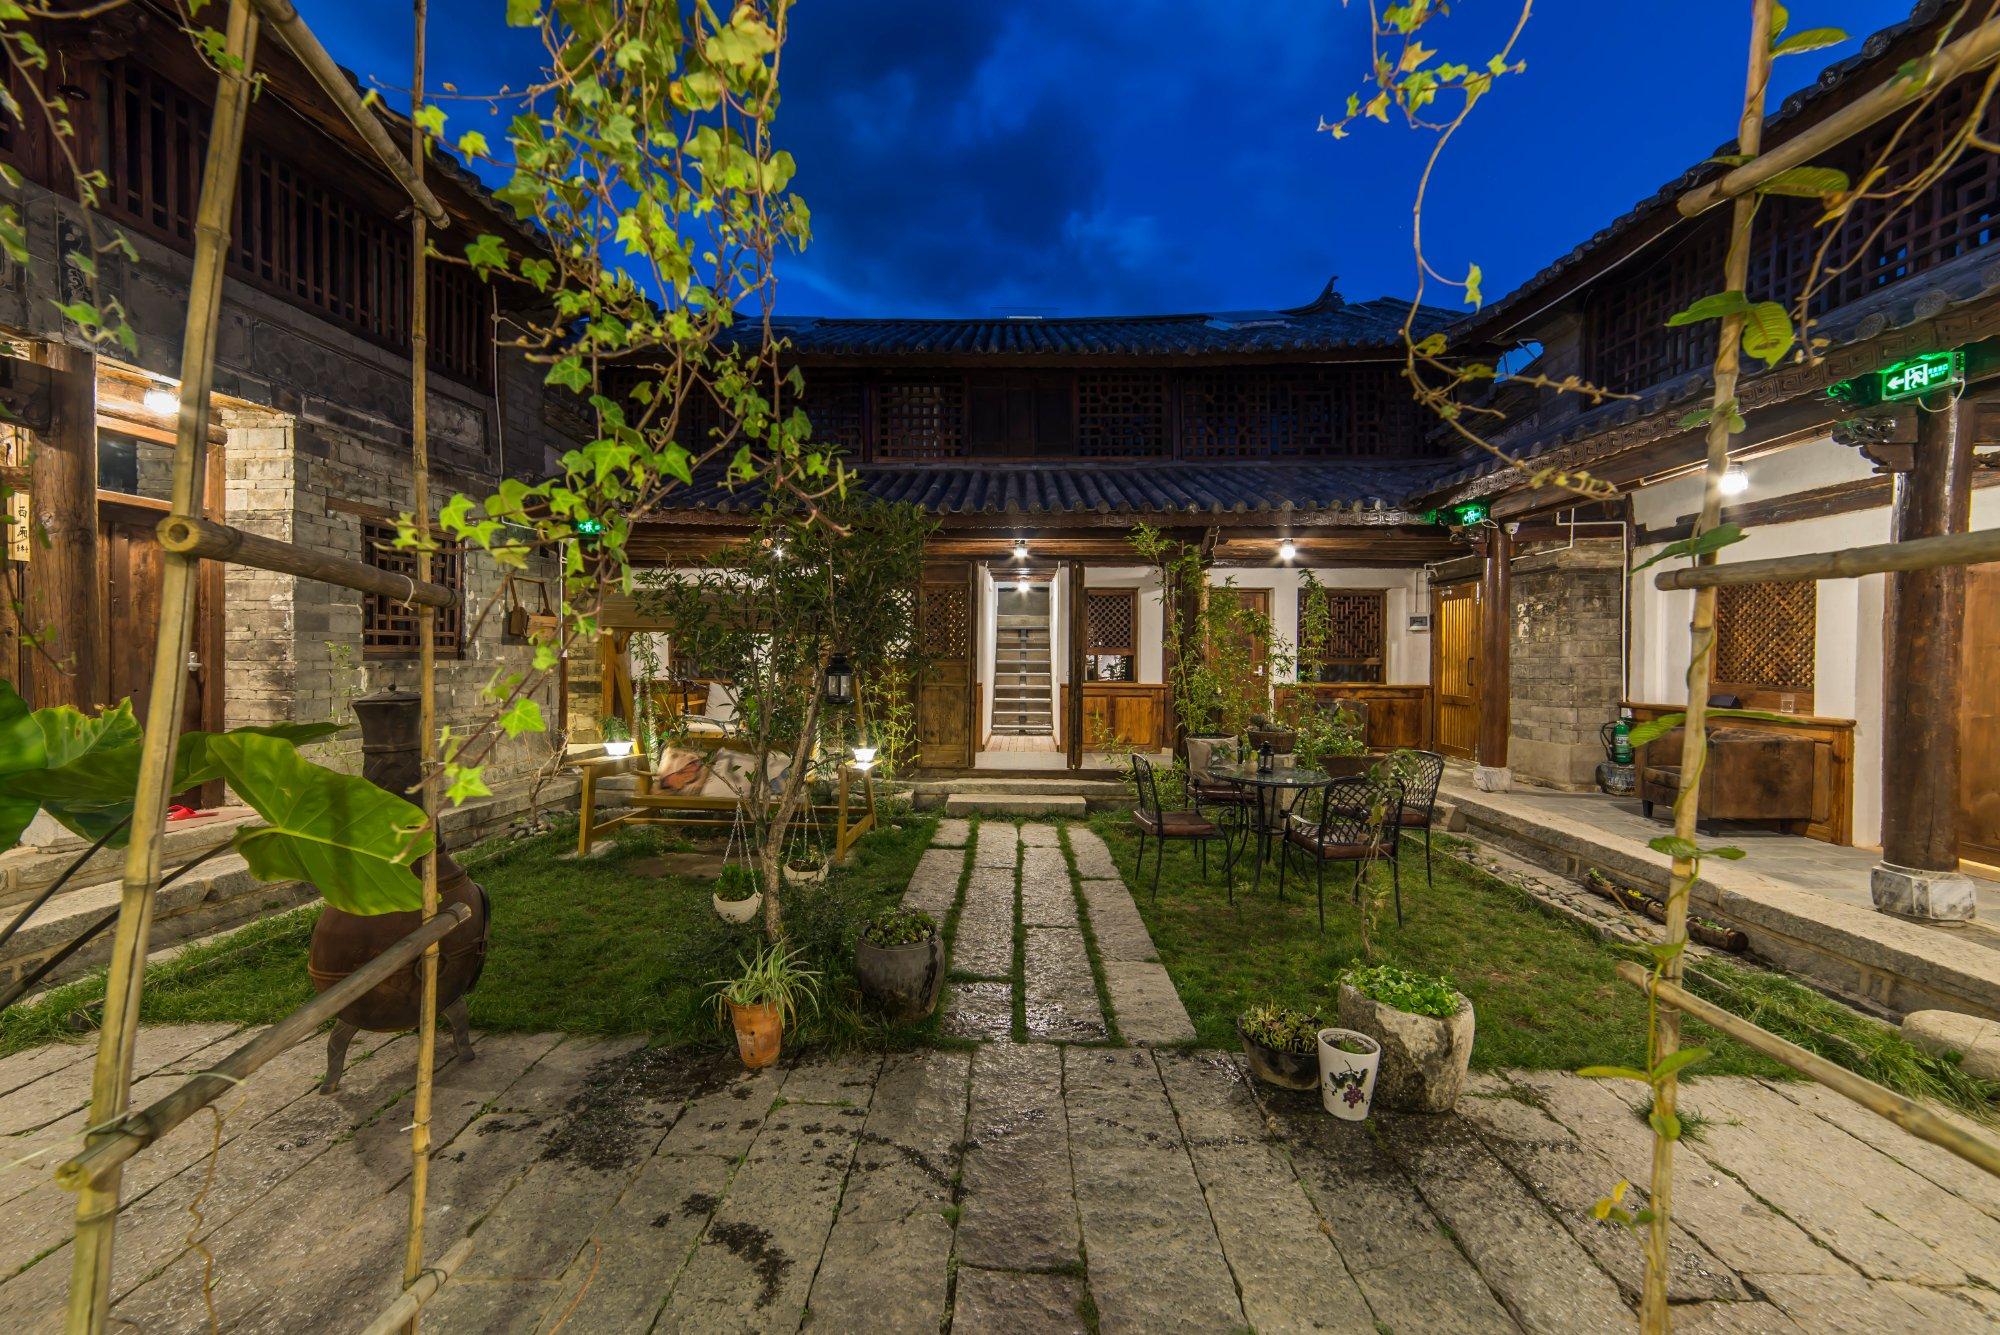 xizhou guzhai inn prices guest house reviews dali china rh tripadvisor com